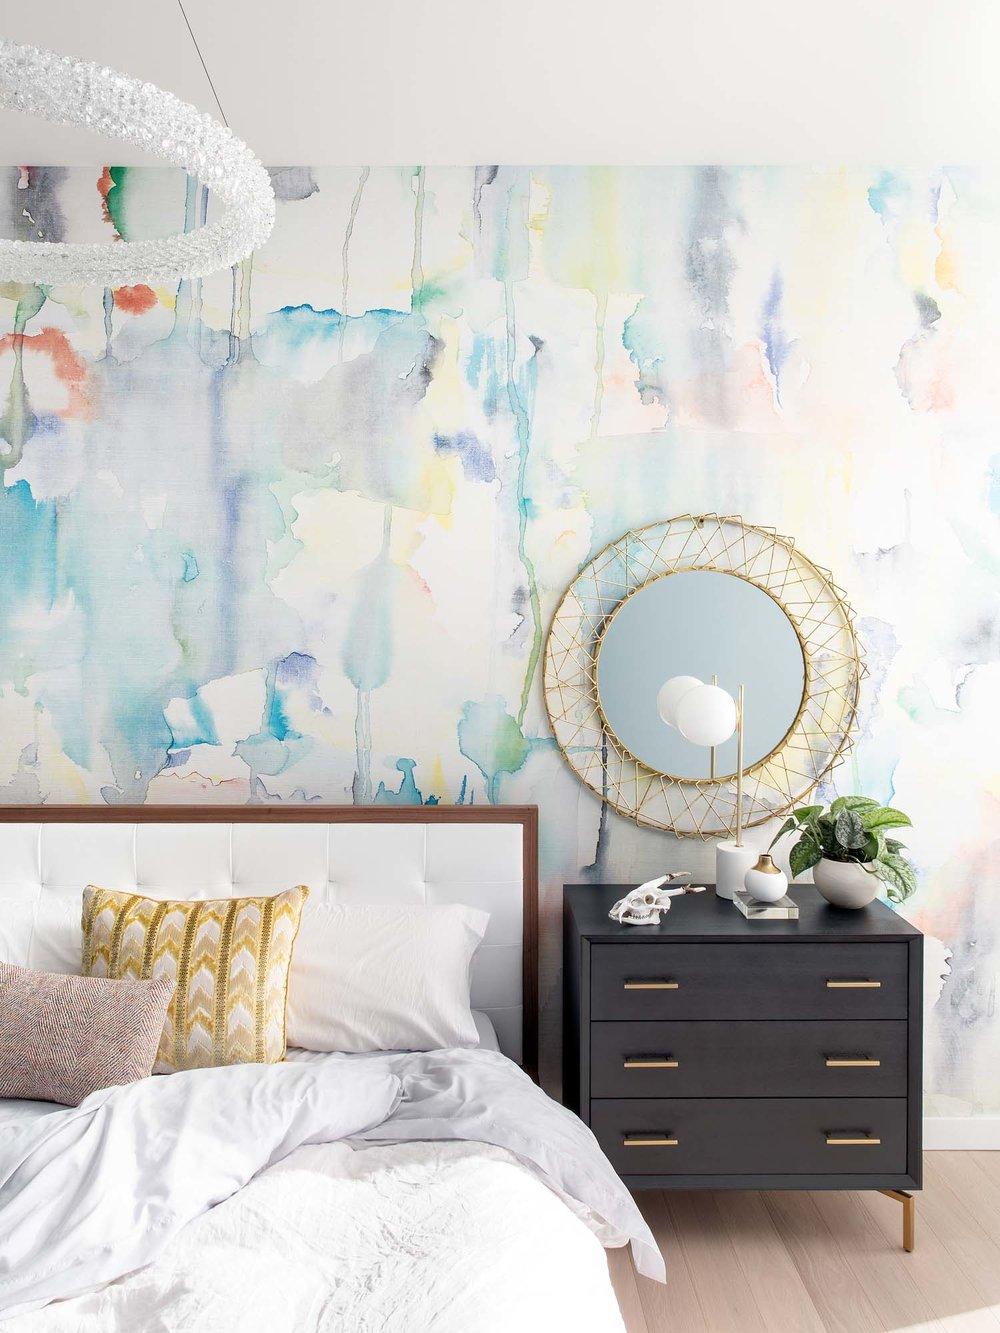 9-Best-Bedroom-Wallpaper-Top-Interior-Designers-Boston-Cambridge-Seaport-Dane-Austin-Design.jpg